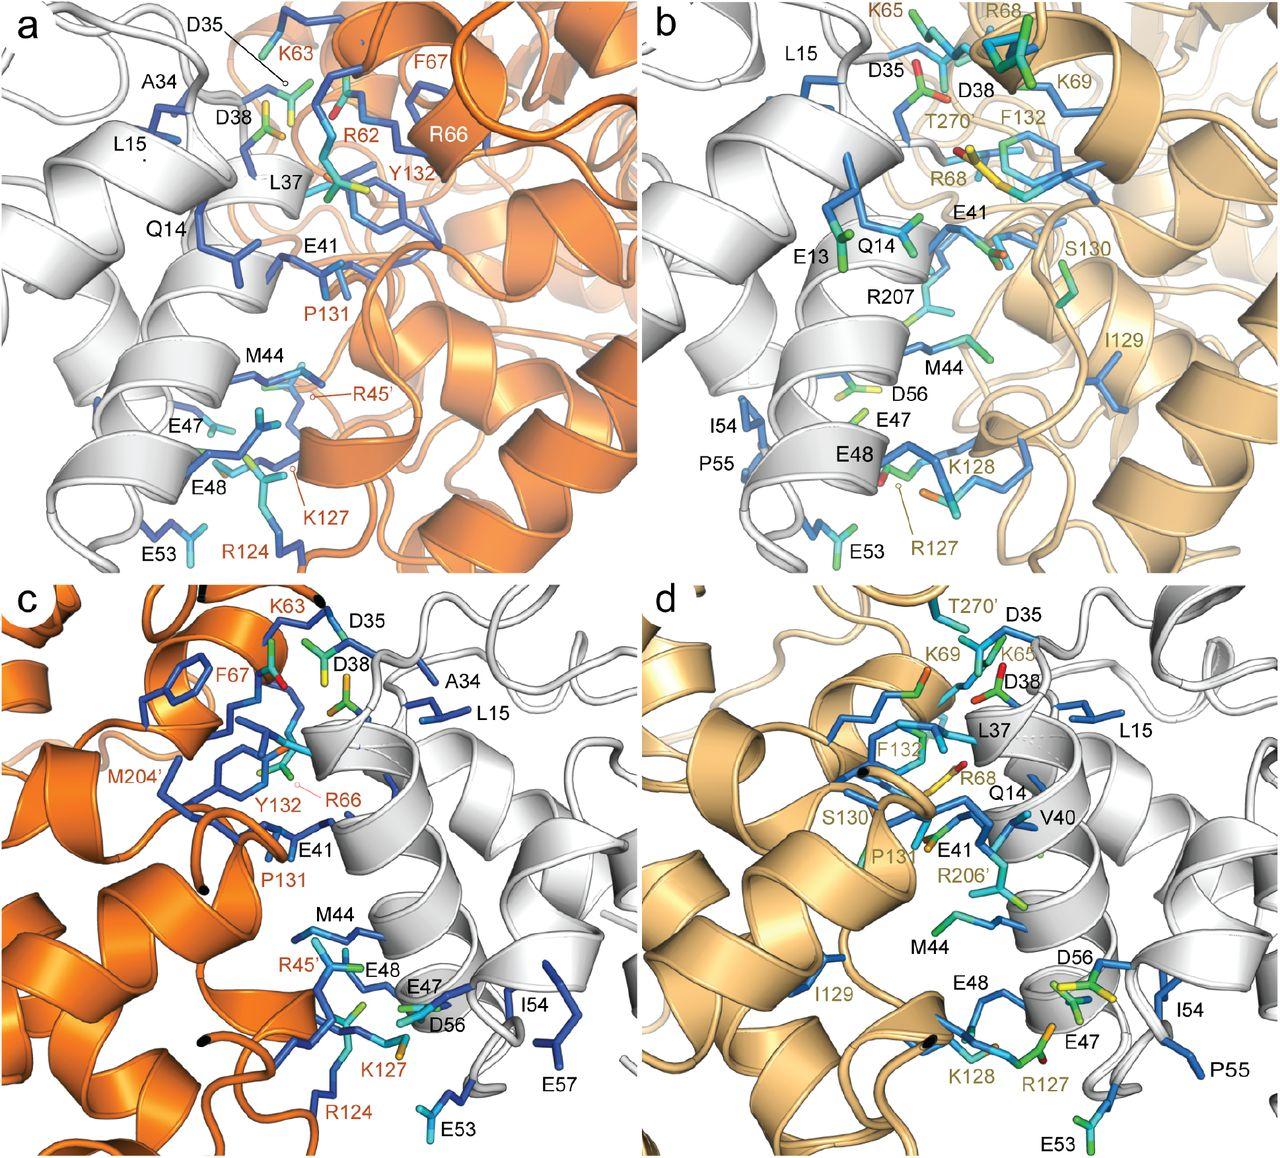 Gating Mechanism of β-Ketoacyl-ACP Synthases | bioRxiv